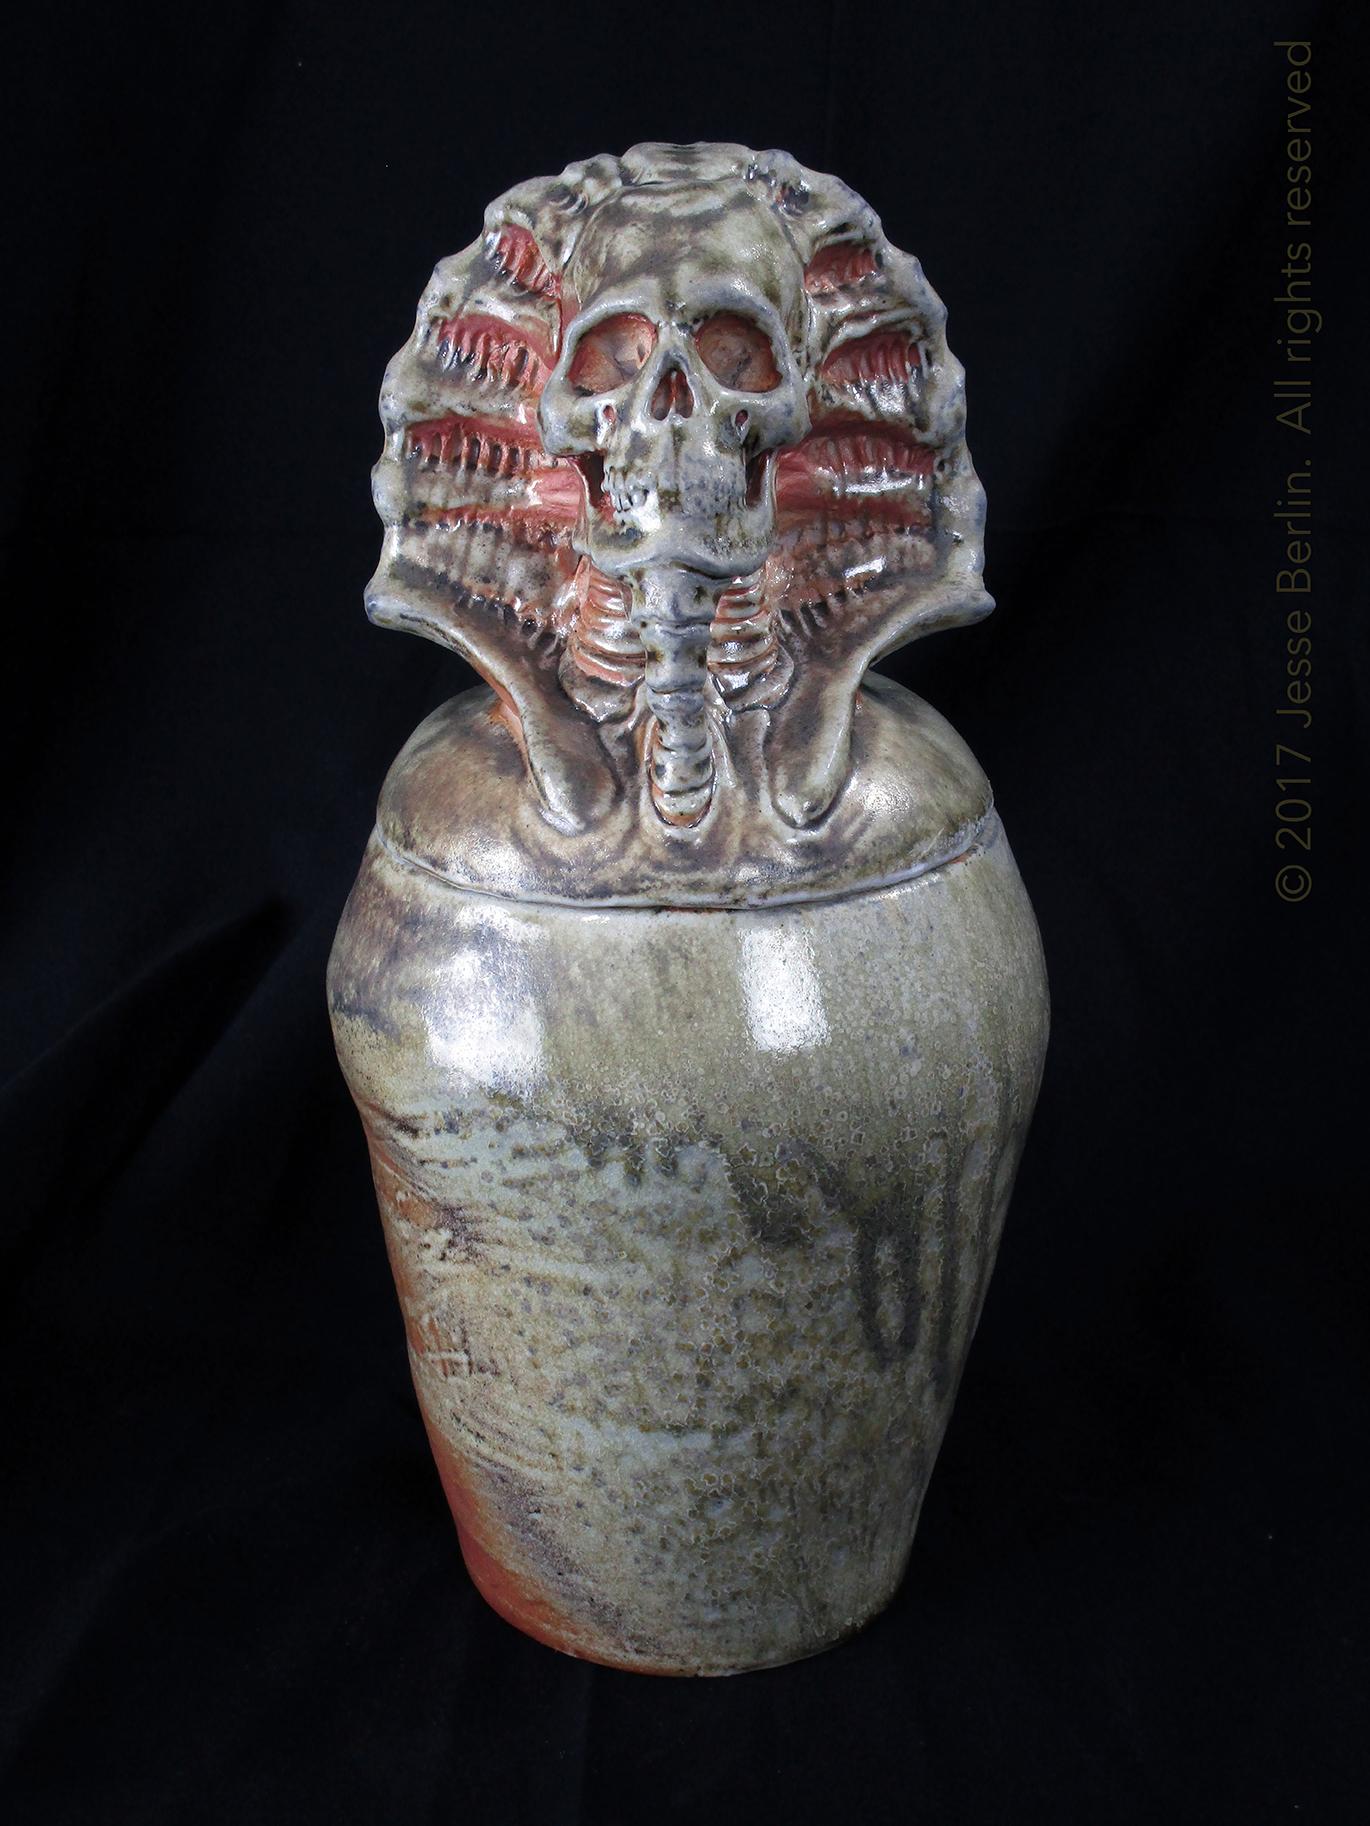 Osiris Canopic Jar/Funerary Urn